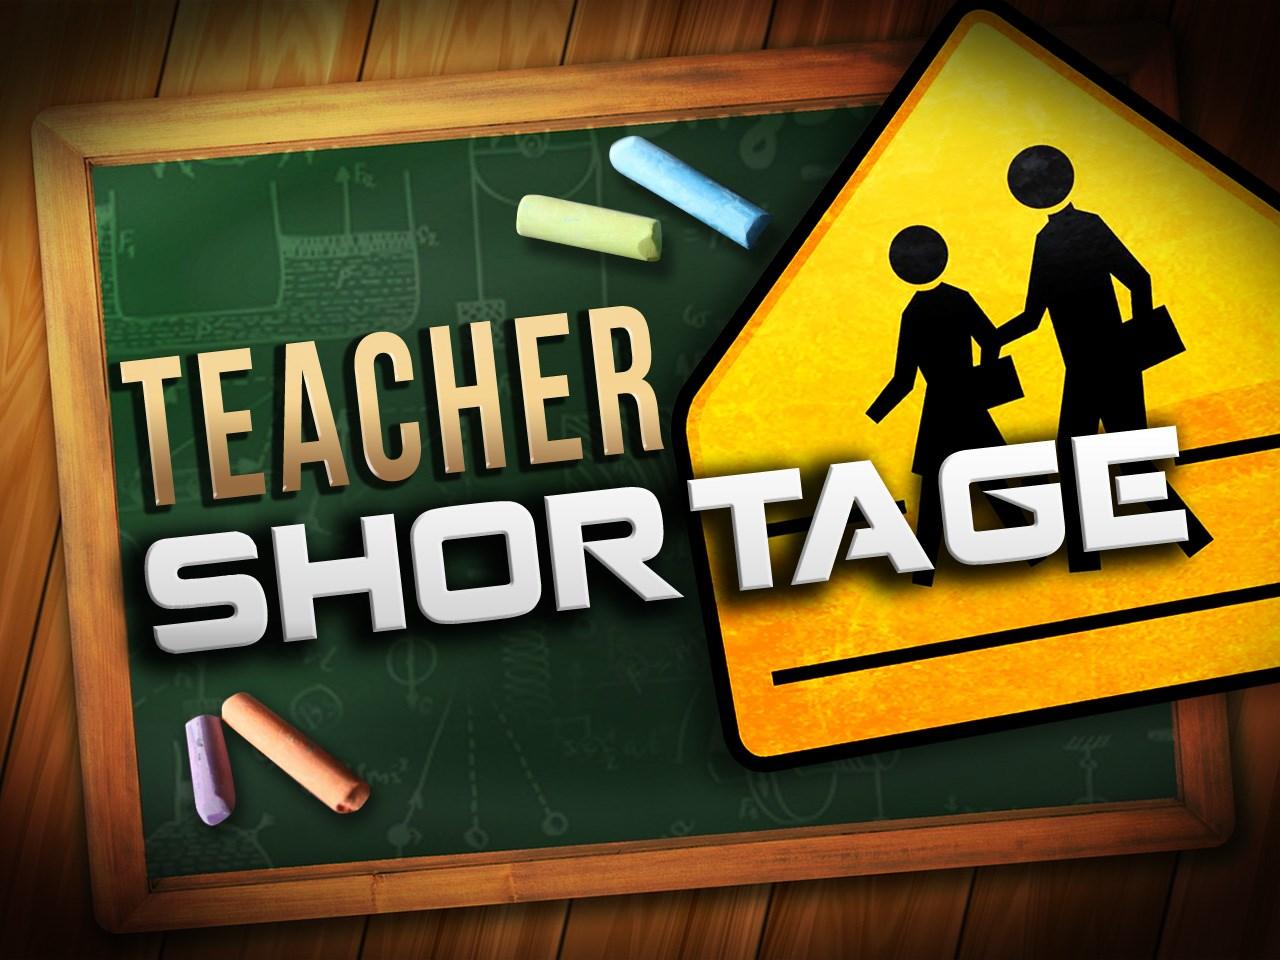 10-18-18 Teacher Shortage_1539895957179.jpg.jpg